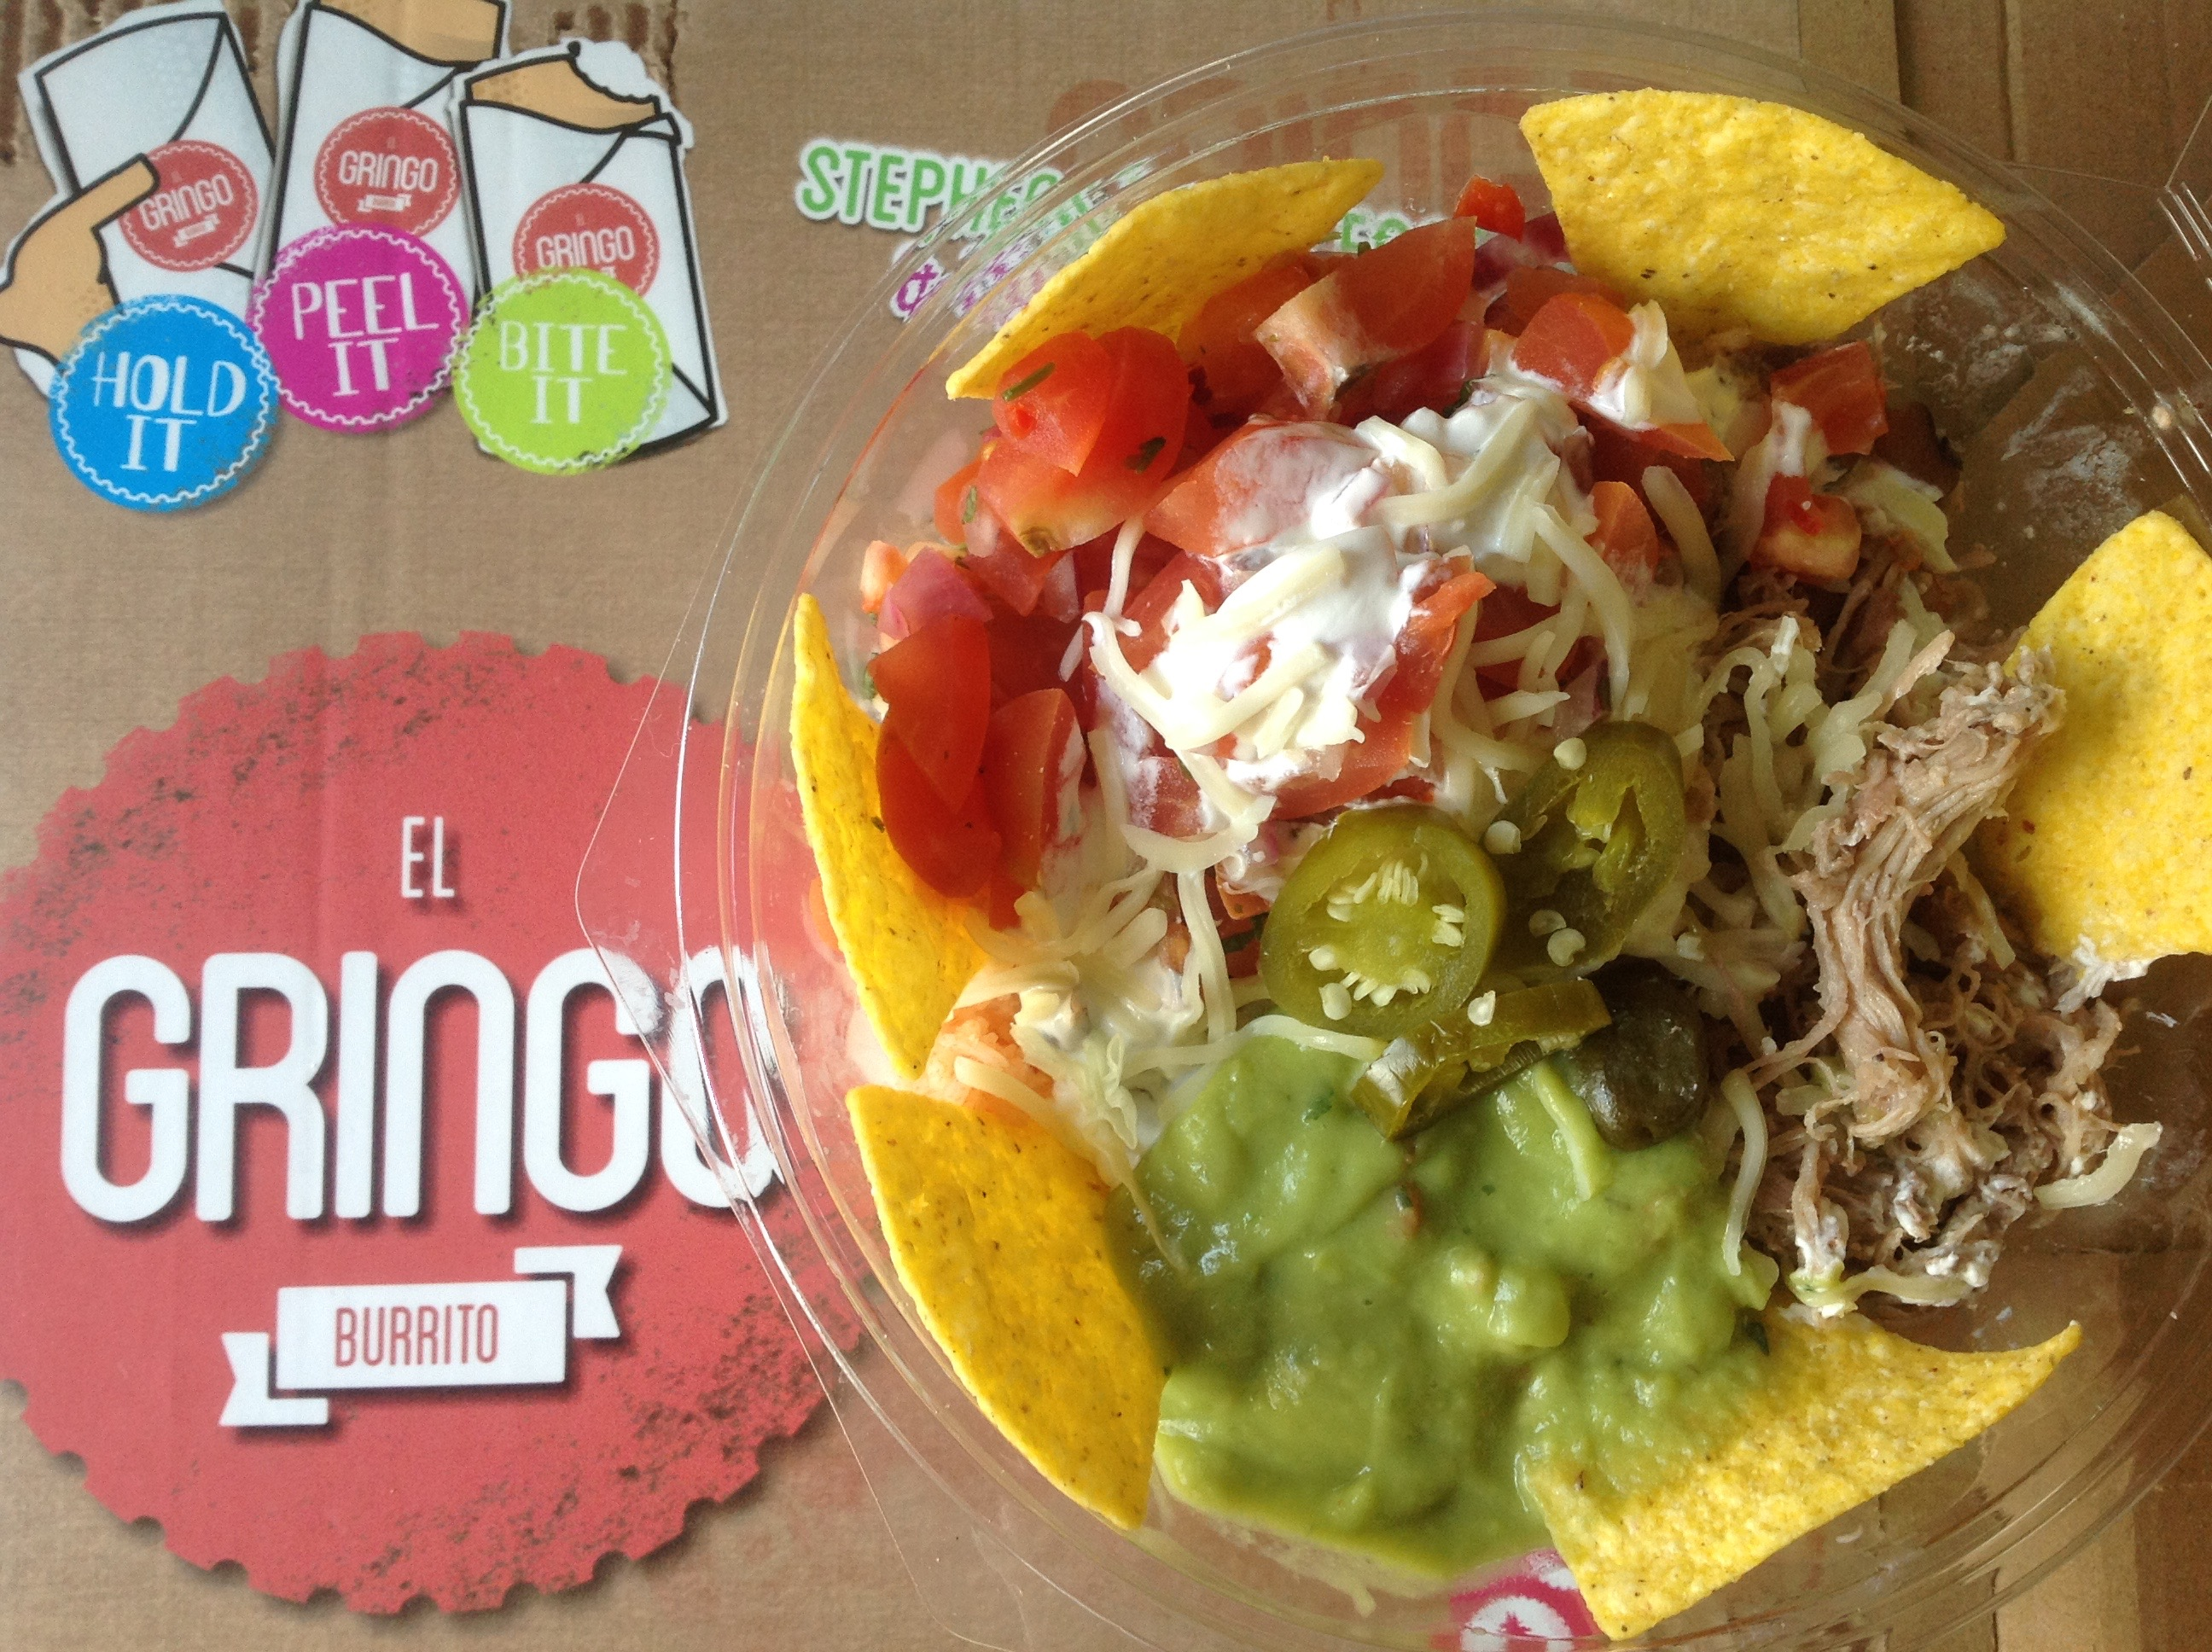 El Gringo Burrito Bowl